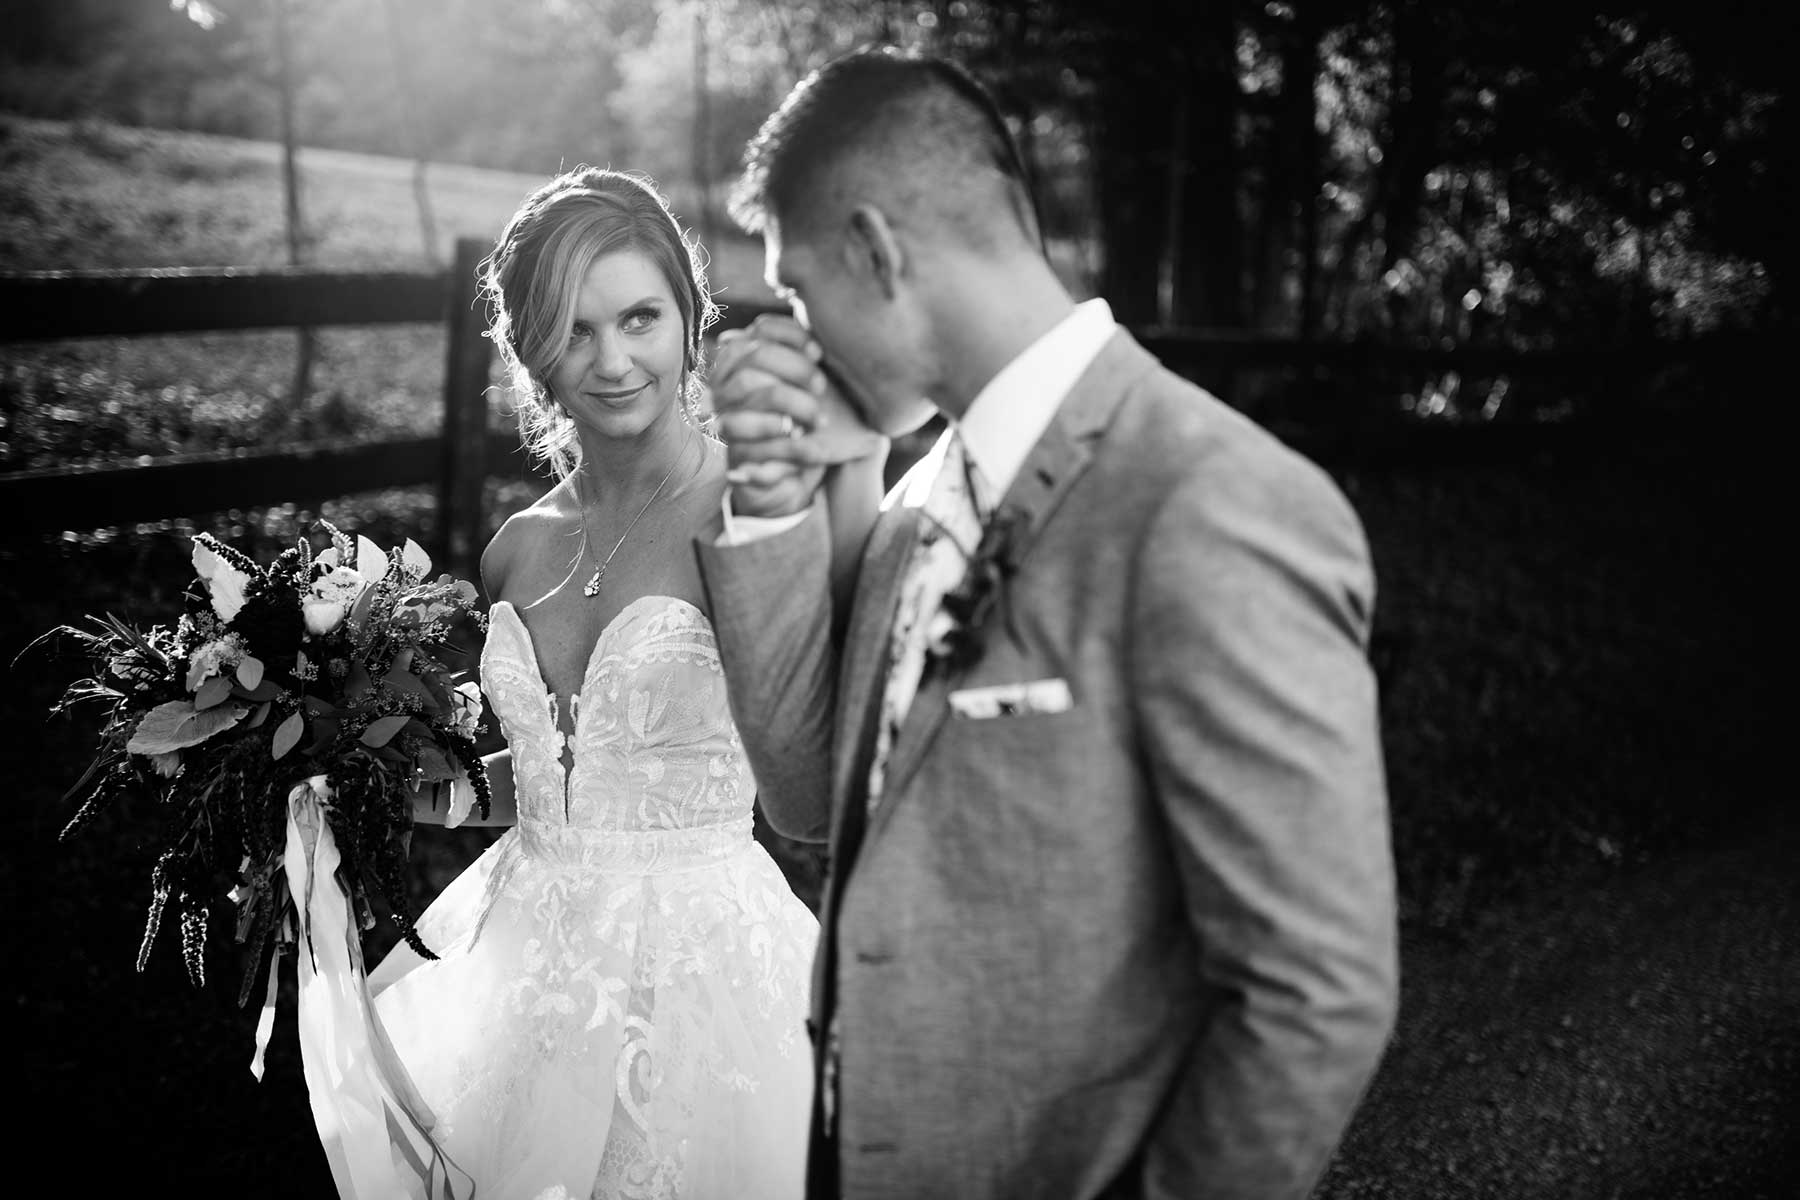 groom kissing brides hand